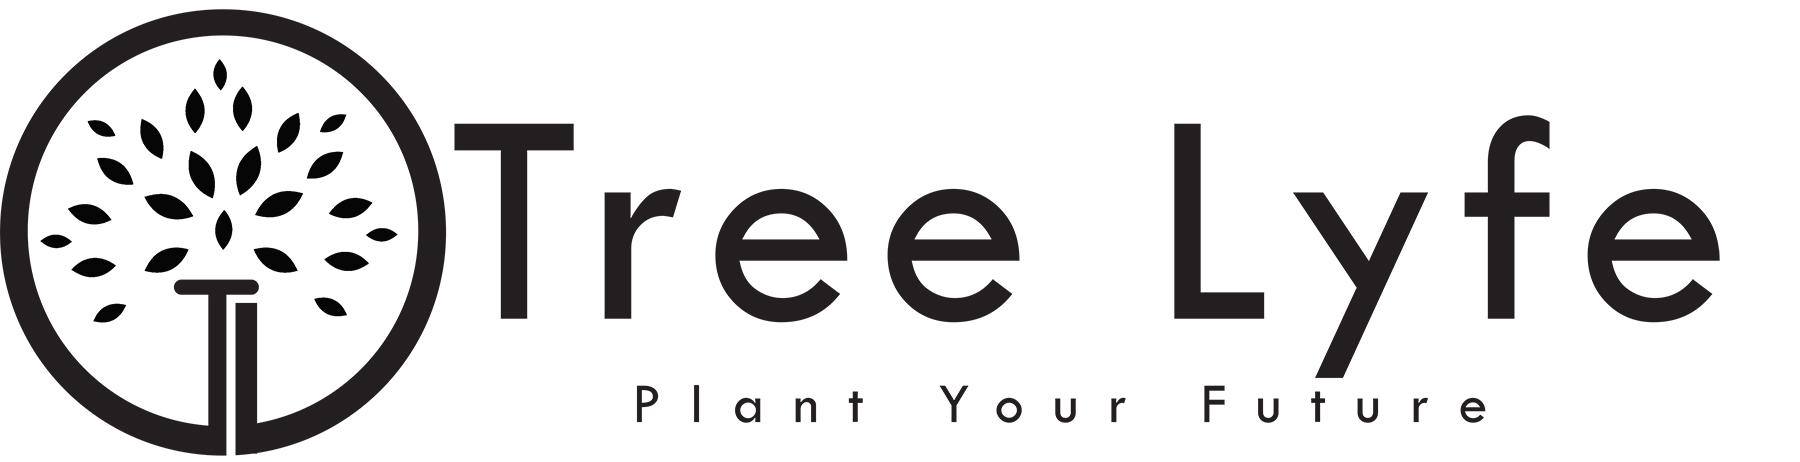 TREE_LYFE_eden.jpg